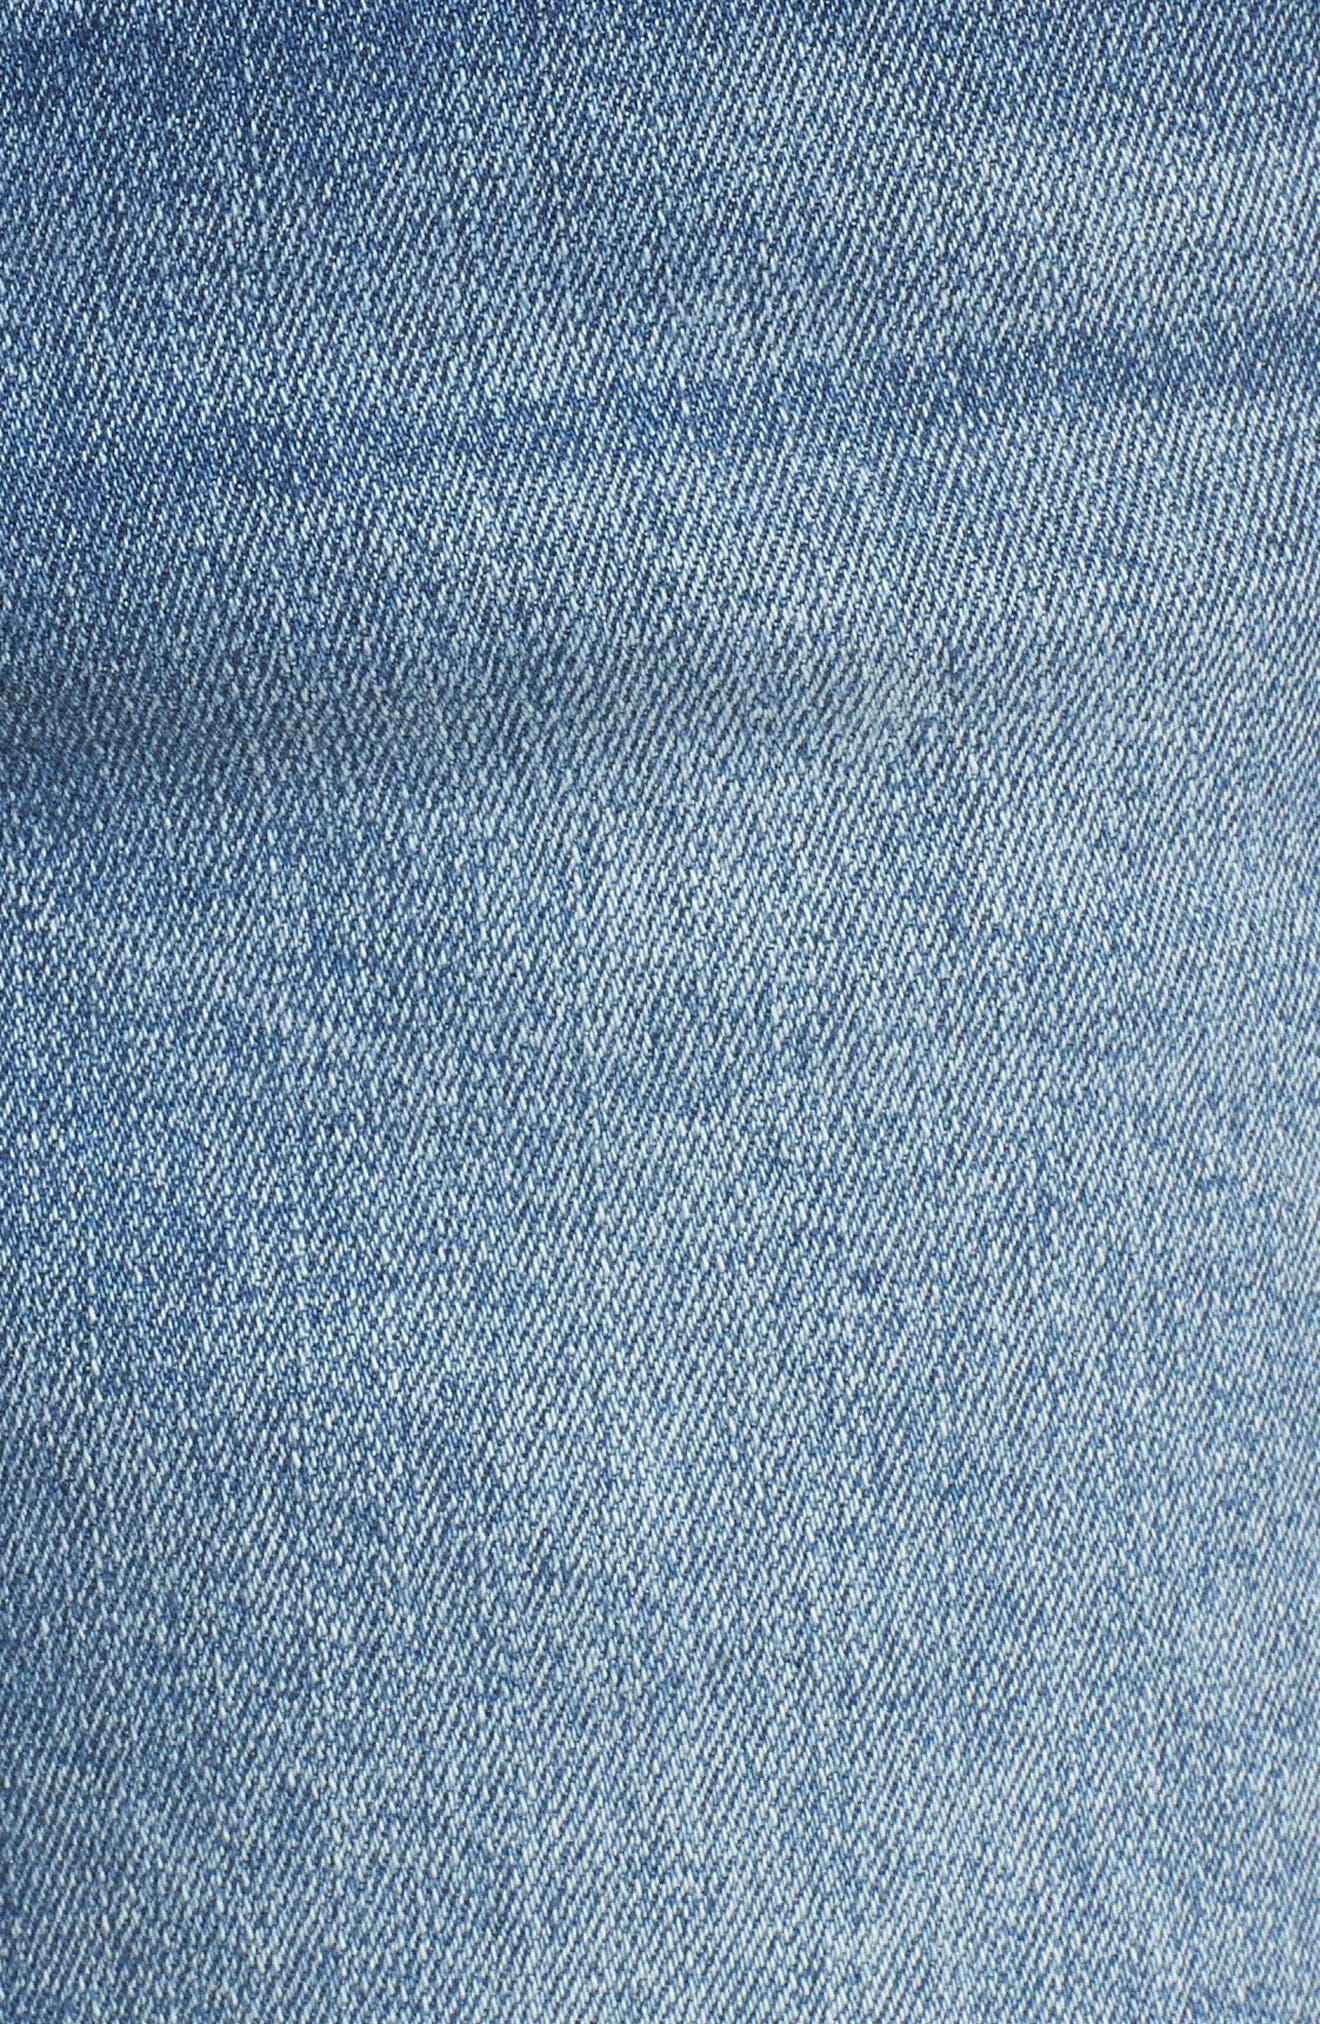 Ab-solution Denim Shorts,                             Alternate thumbnail 5, color,                             458